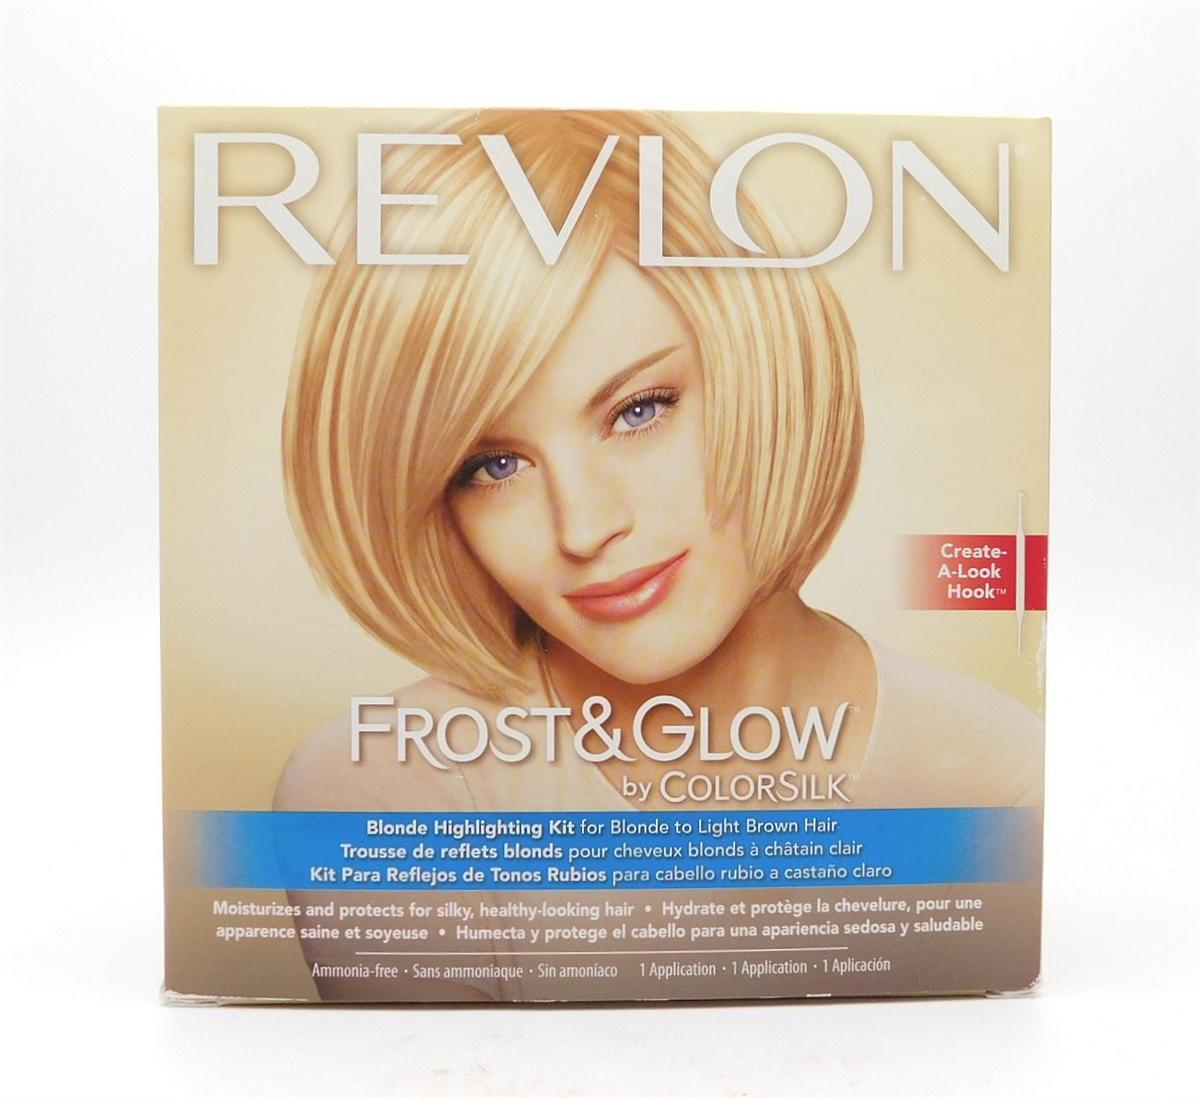 Revlon Frost Glow By Colorsilk Blonde Highlighting Kit For Blonde